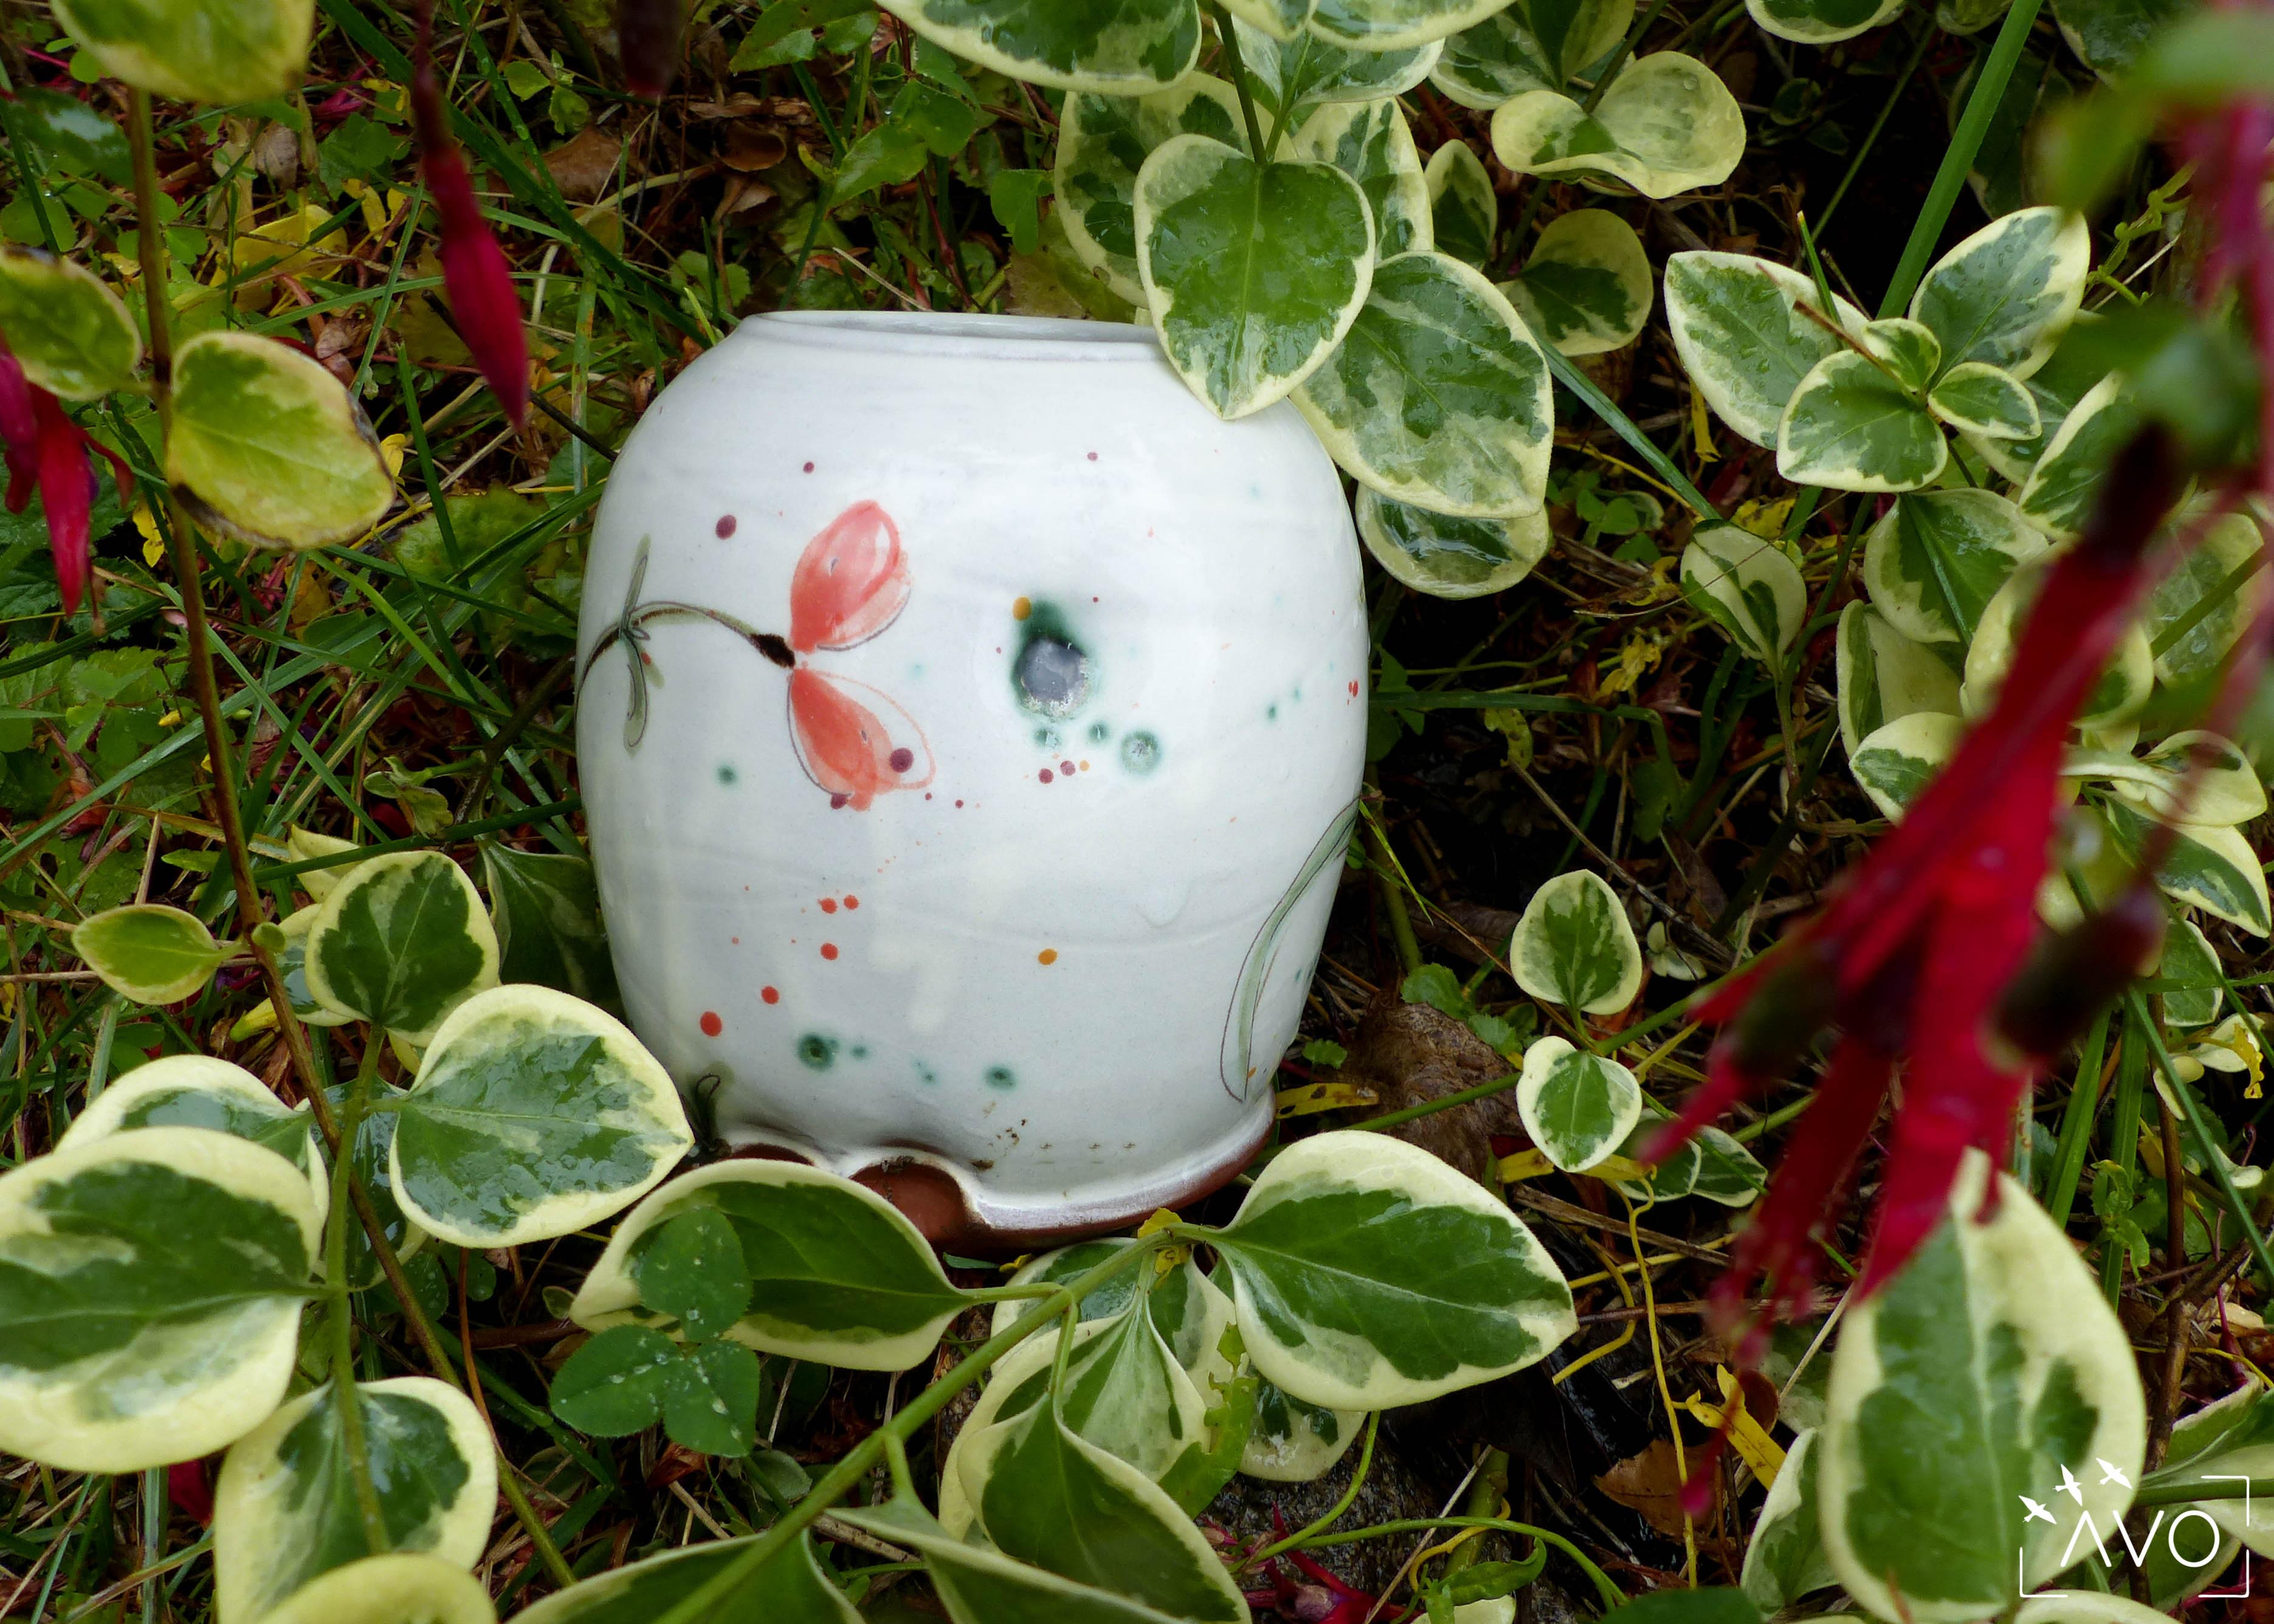 marina-leflon-ceramiste-courzieu-atelier-gres-faience-fleurs-terre-avo-avoldooiseau-ceramiques-art-de-la-table-poterie